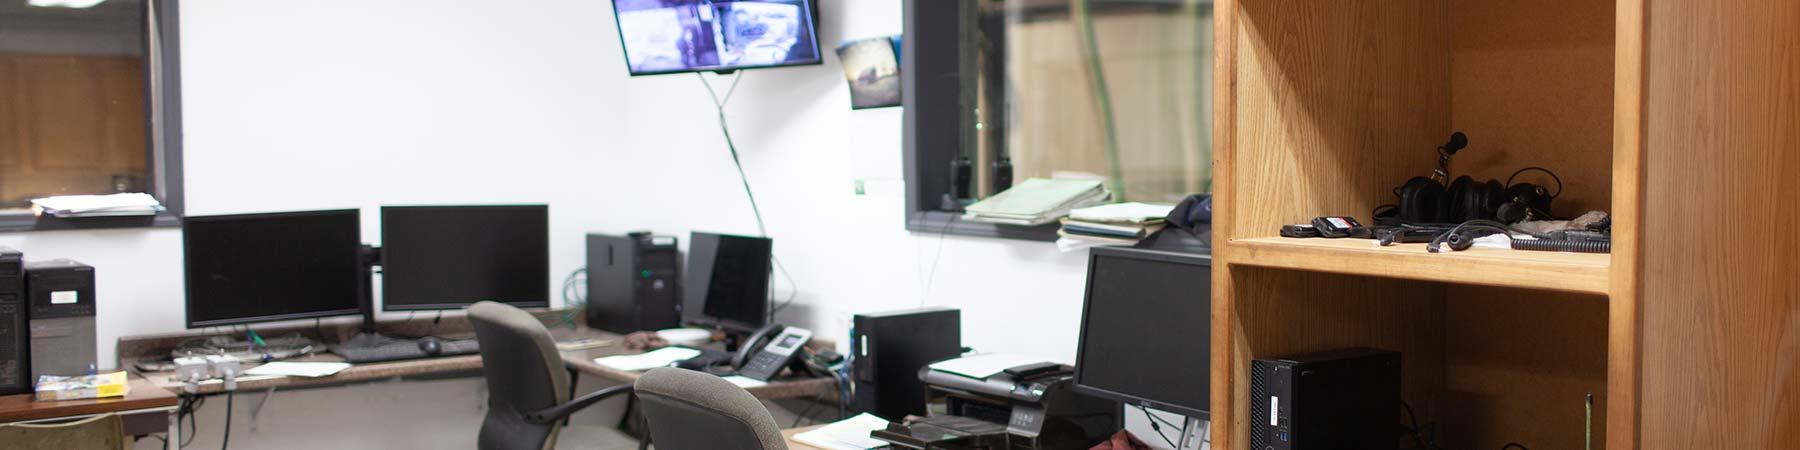 fleet service of tulsa oilfield test pit control room